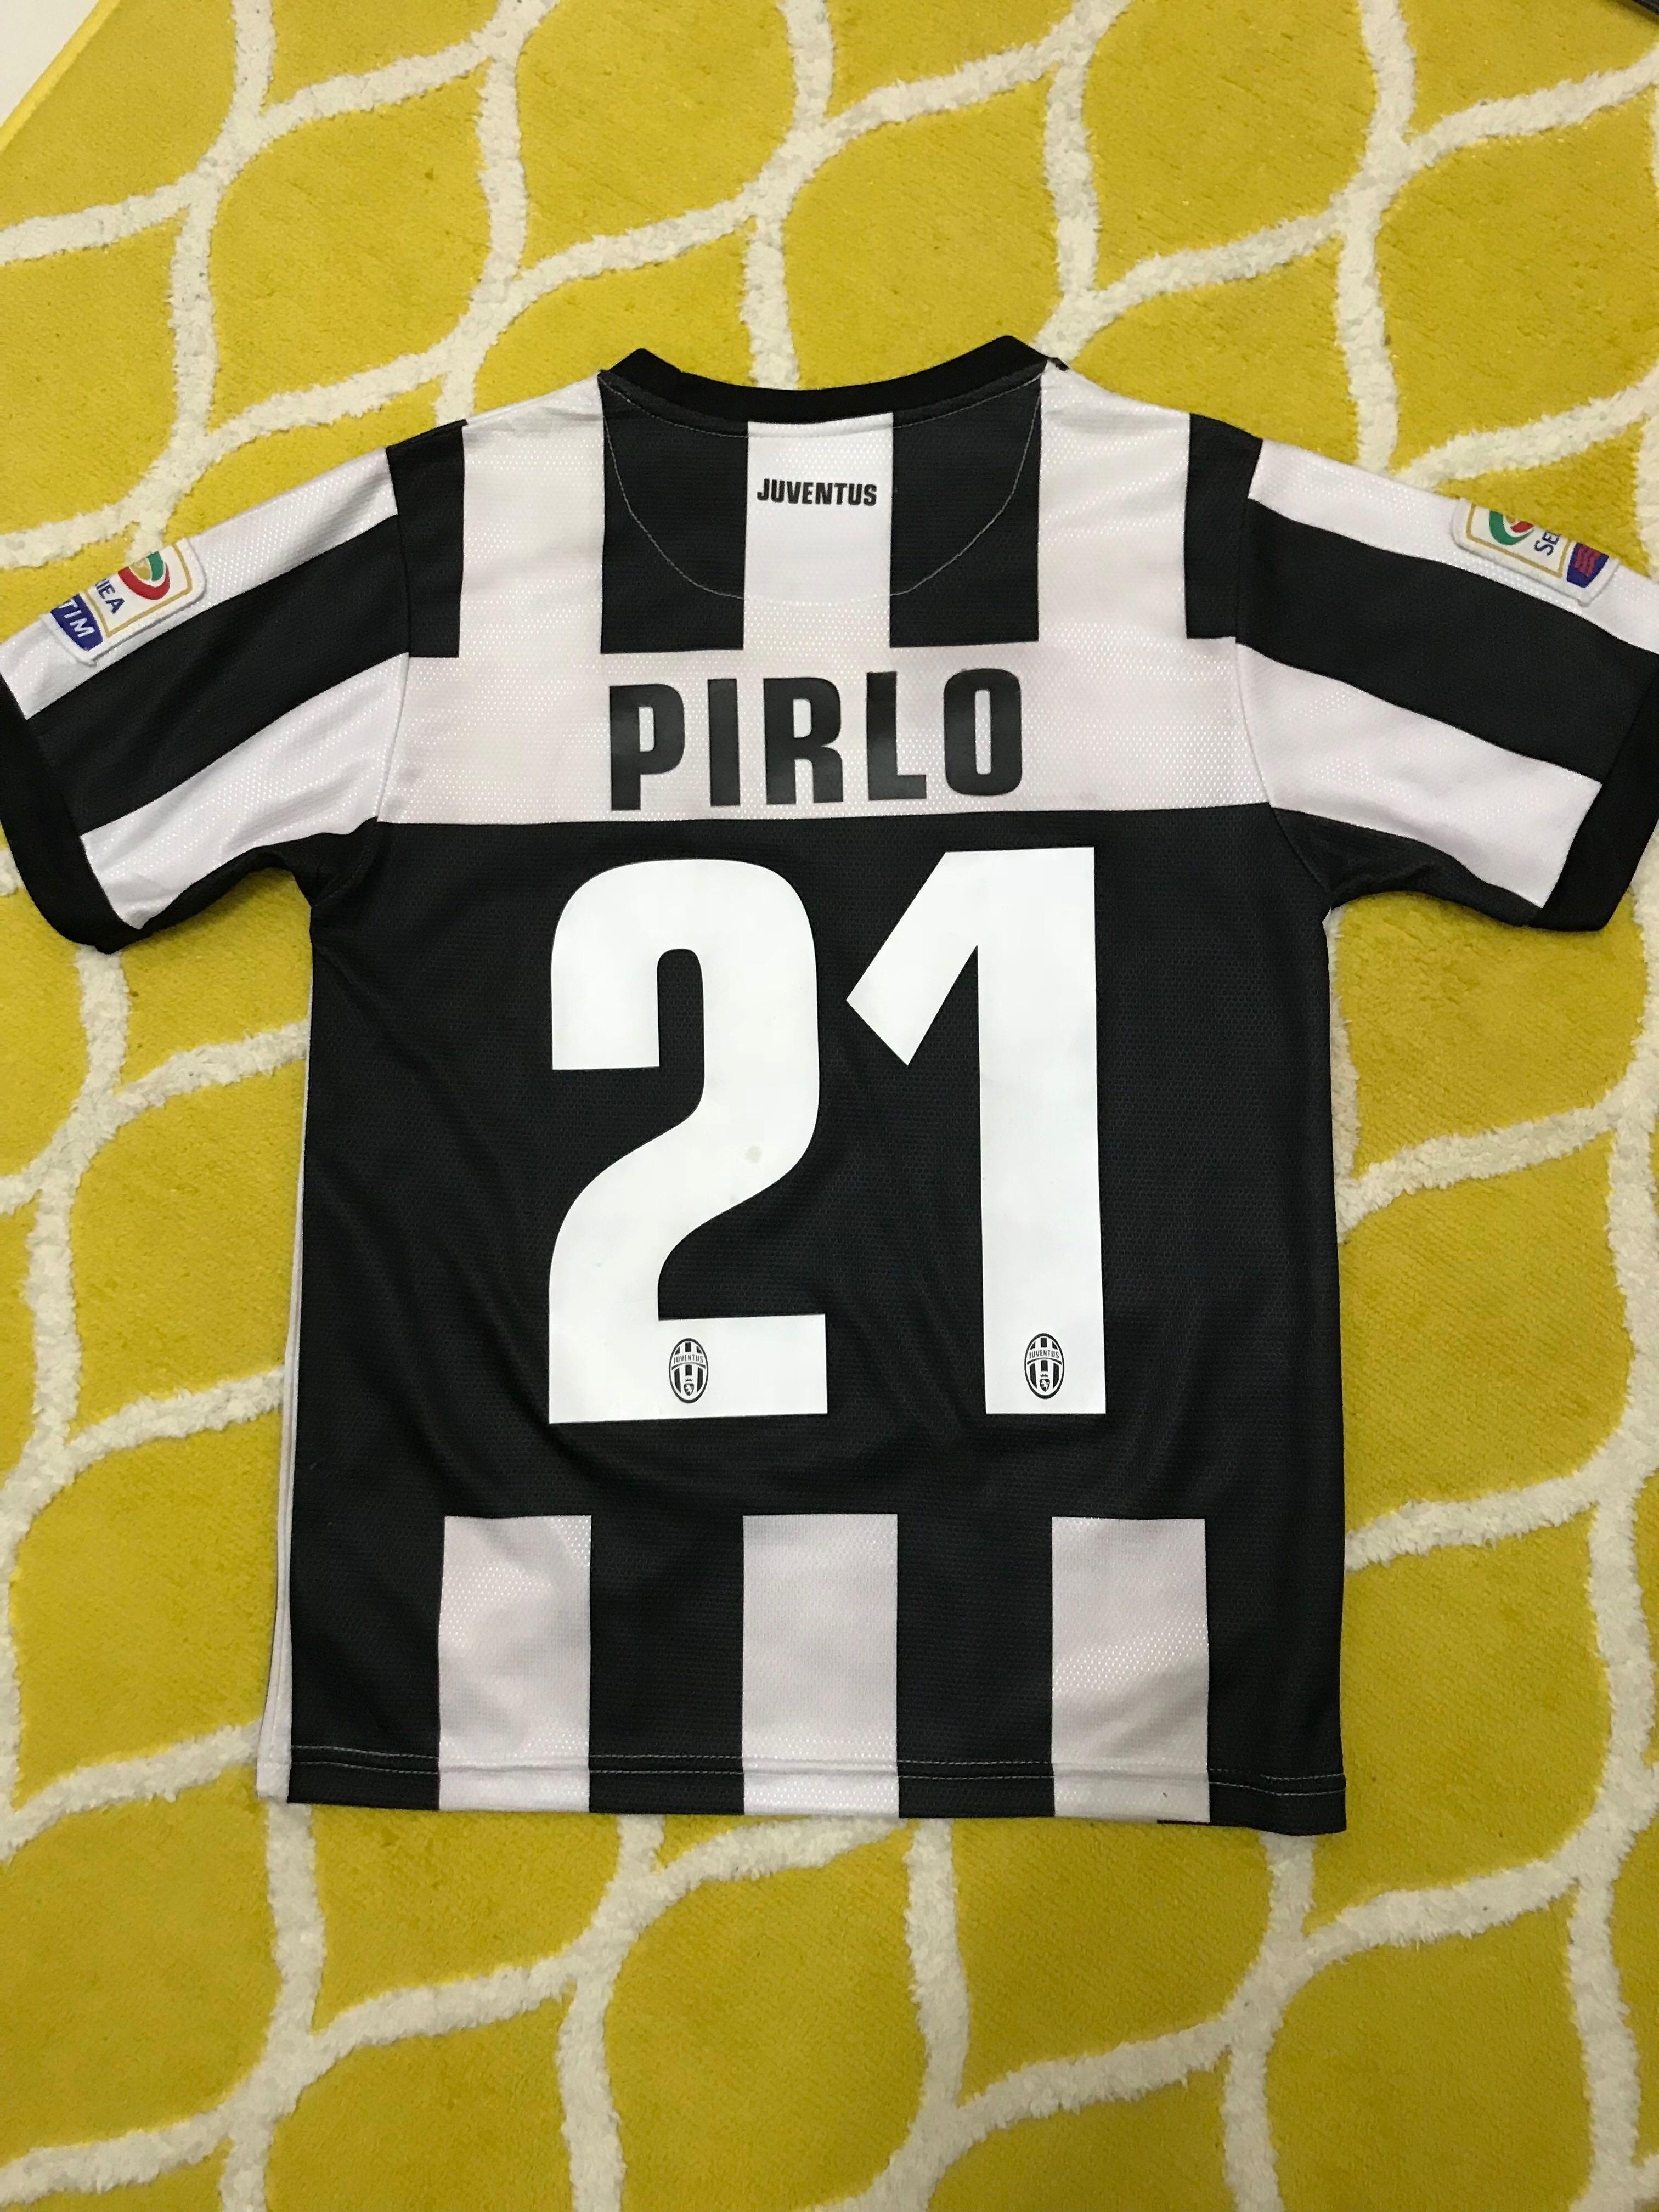 29f1669e256 Nike Juventus  PIRLO 21  2012-2013 Home Jersey